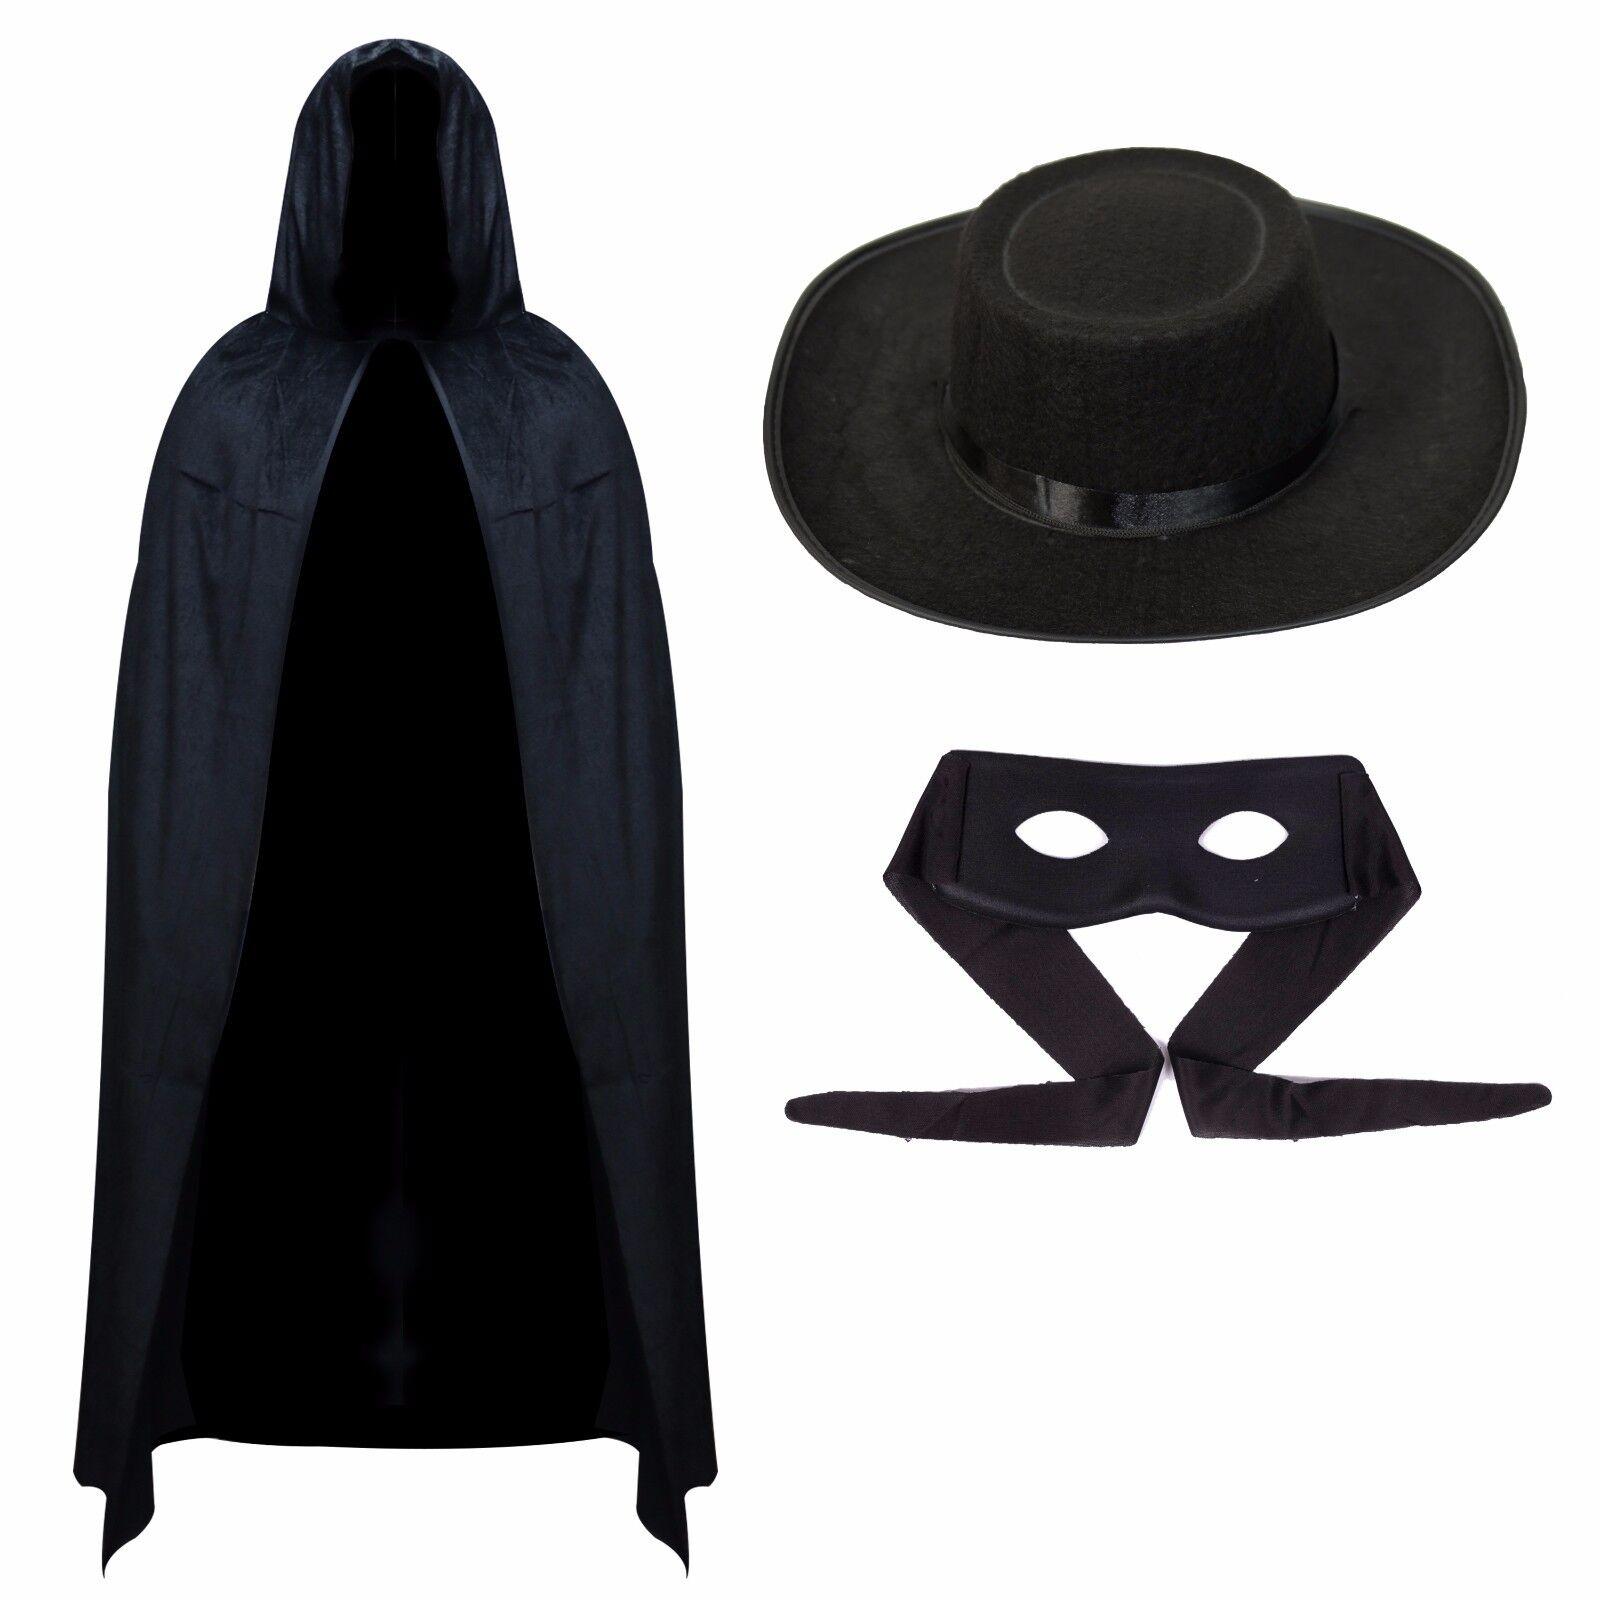 Mens Value Zorro Halloween Masquerade Outfit - Black Cape, E